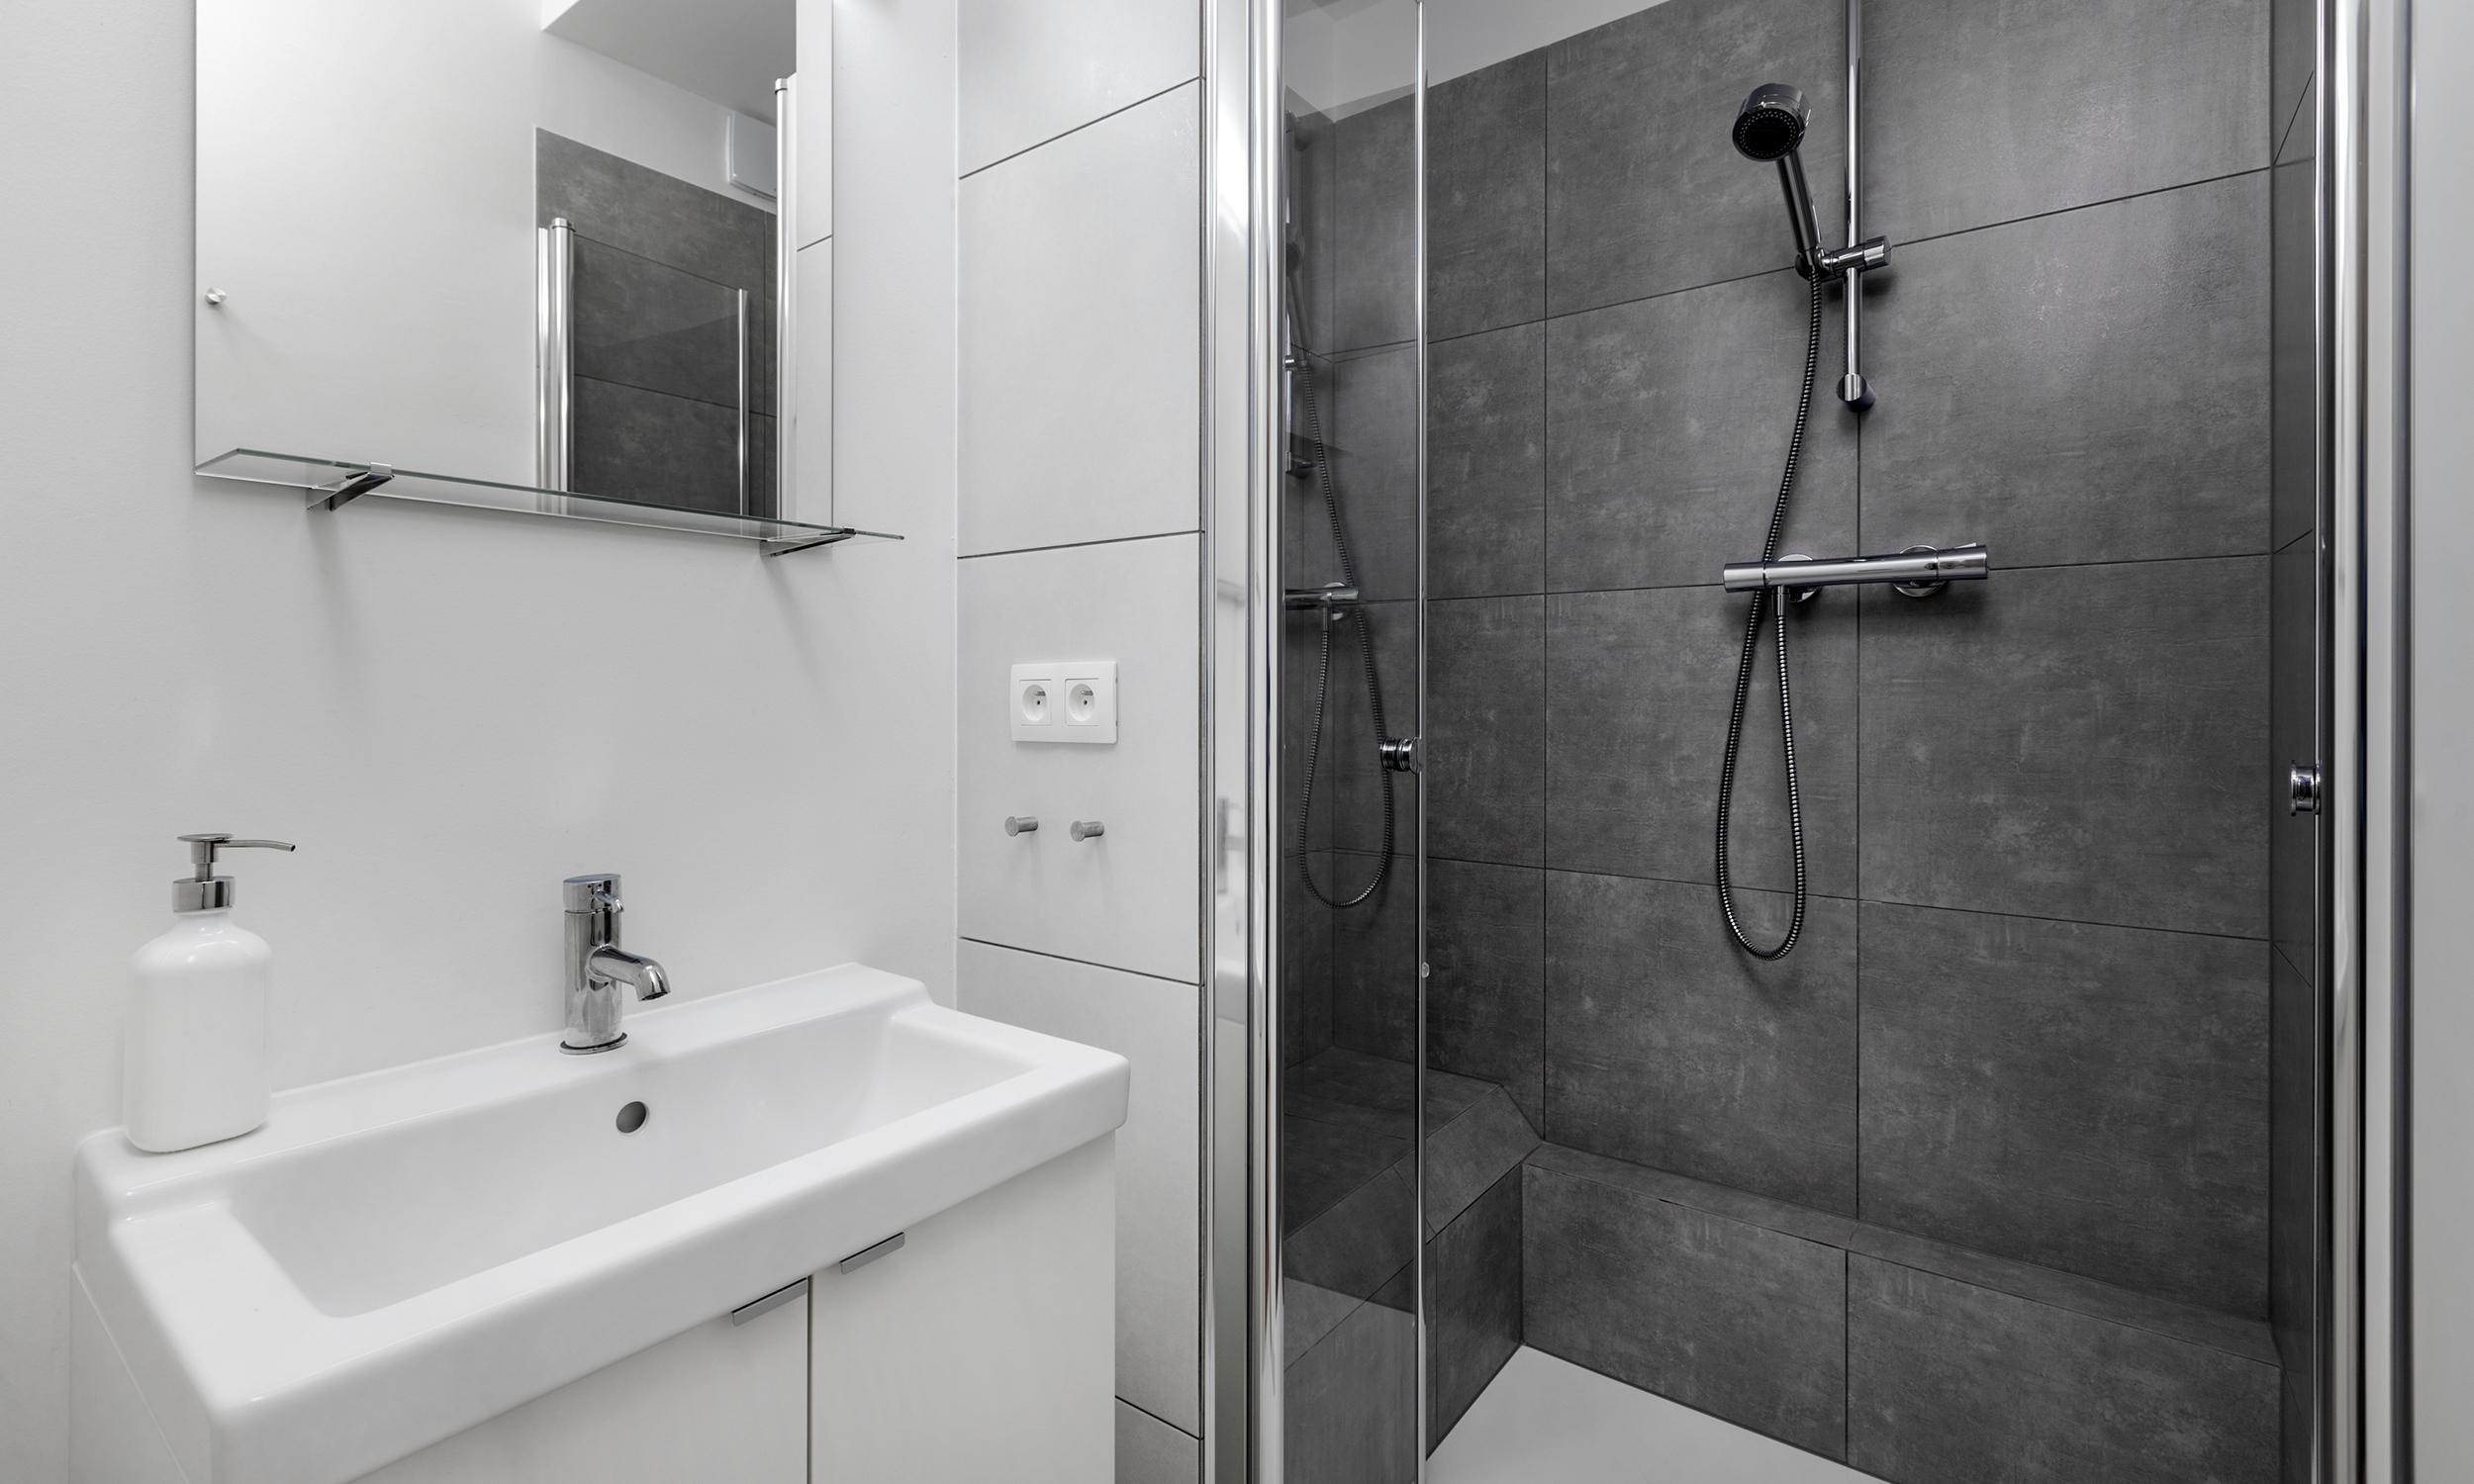 badezimmer rules architekten. Black Bedroom Furniture Sets. Home Design Ideas